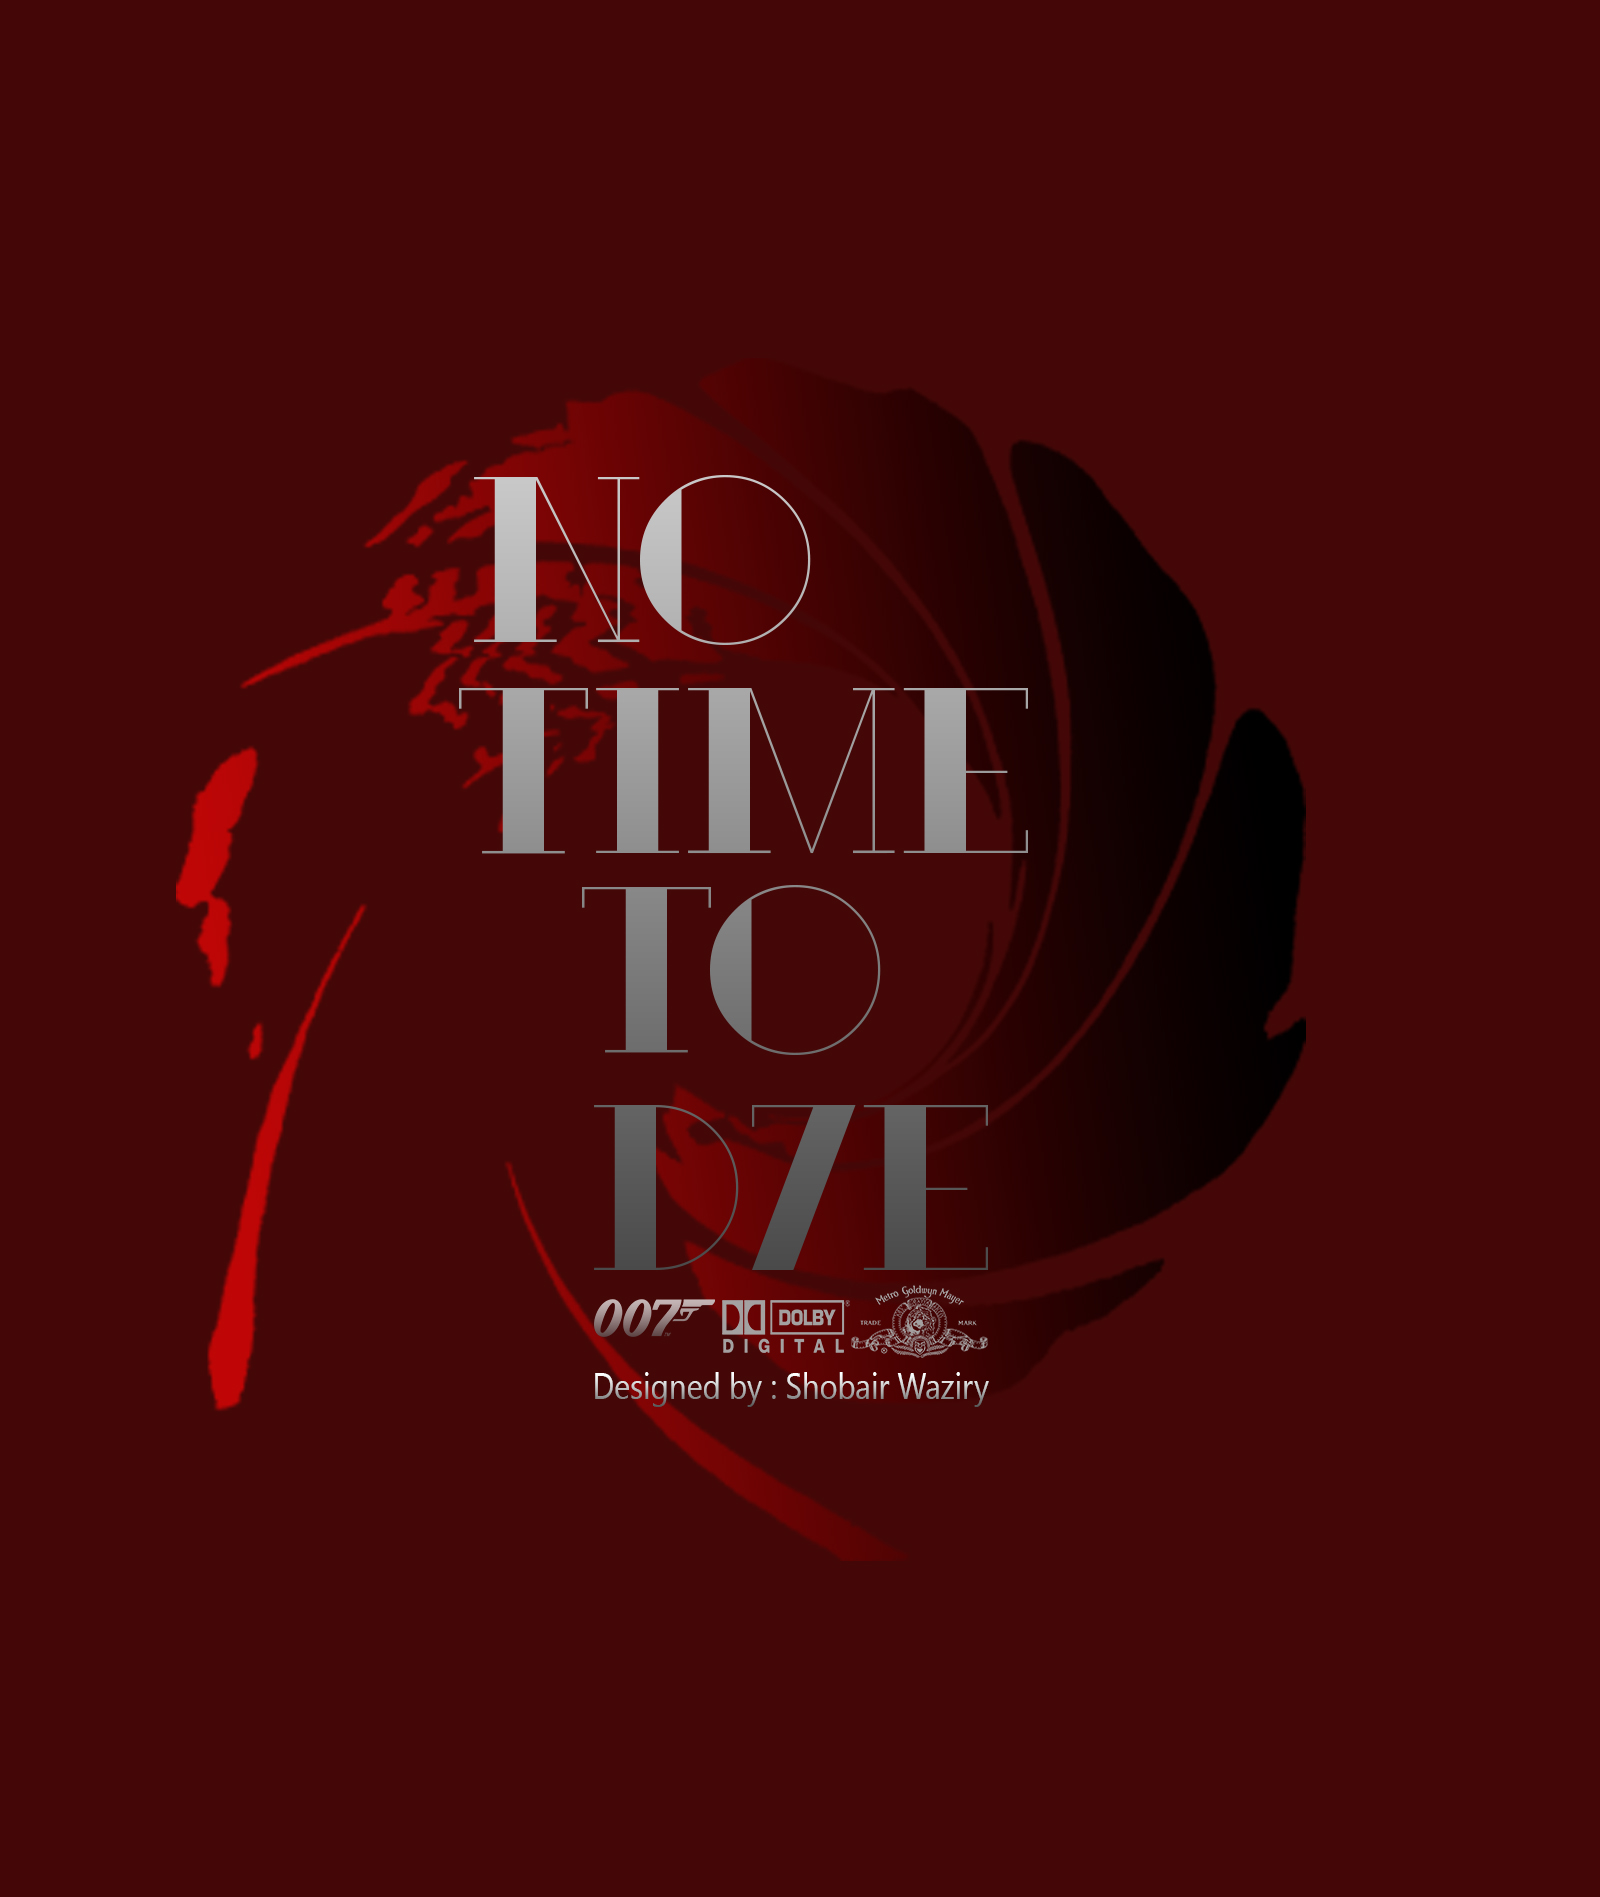 No-Time-To-Die-shobairgraphic-bond25-952019.jpg